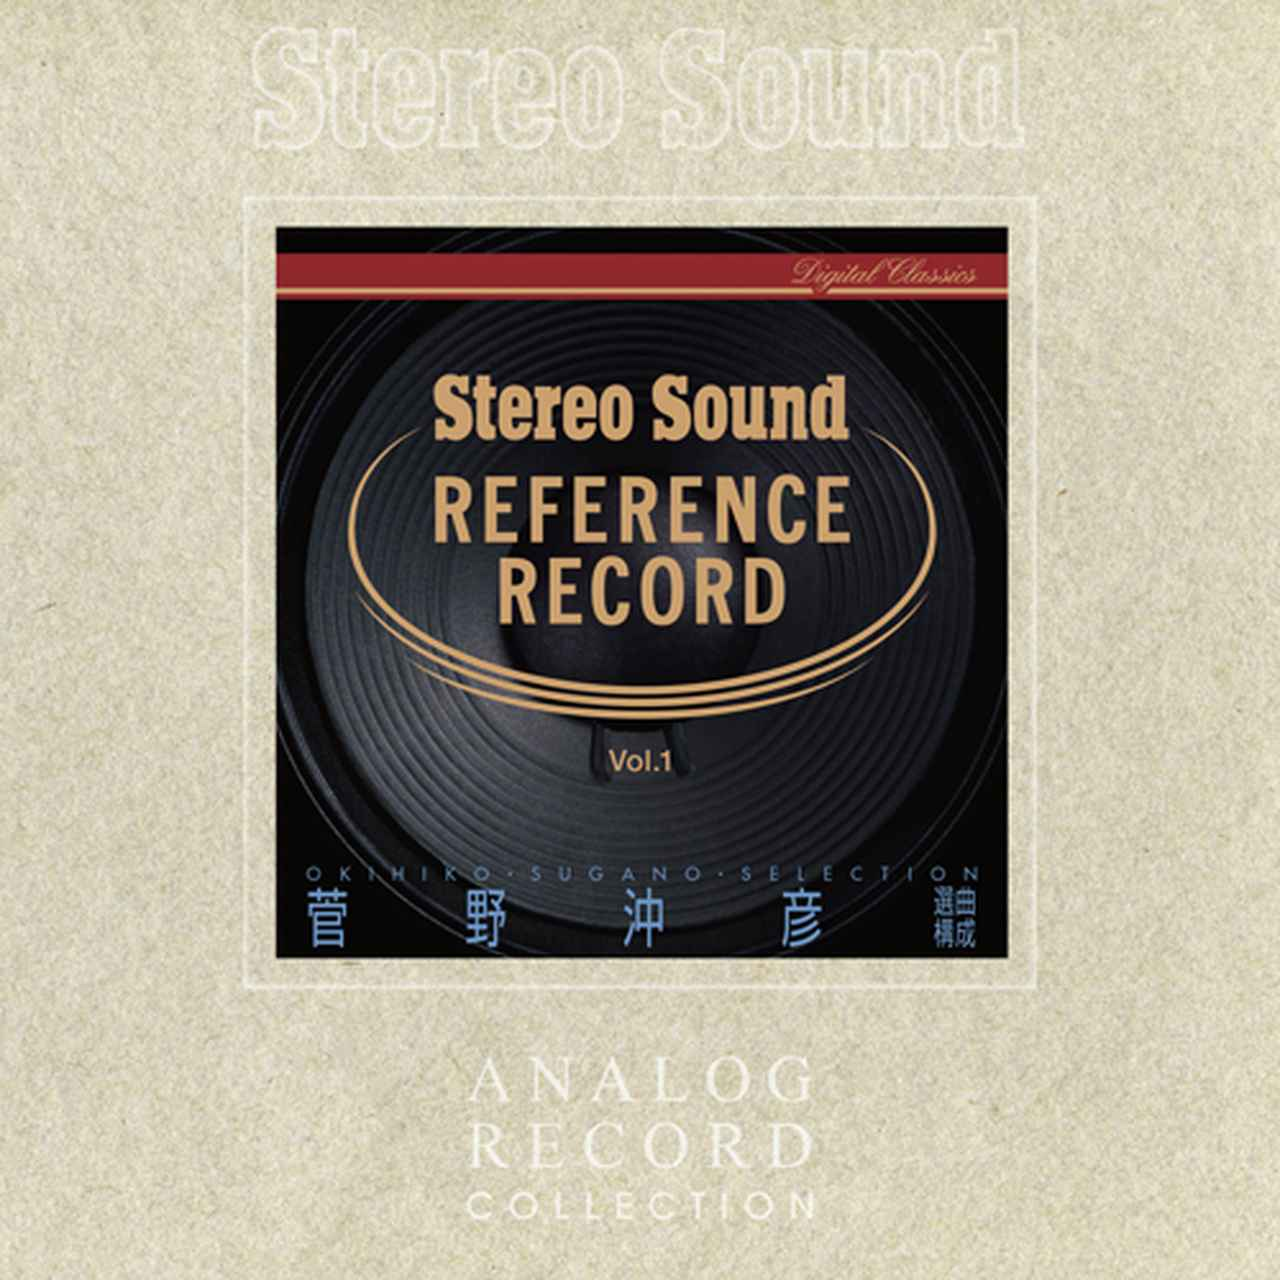 Images : 5番目の画像 - オーディオ名盤コレクション最新作 - Stereo Sound ONLINE